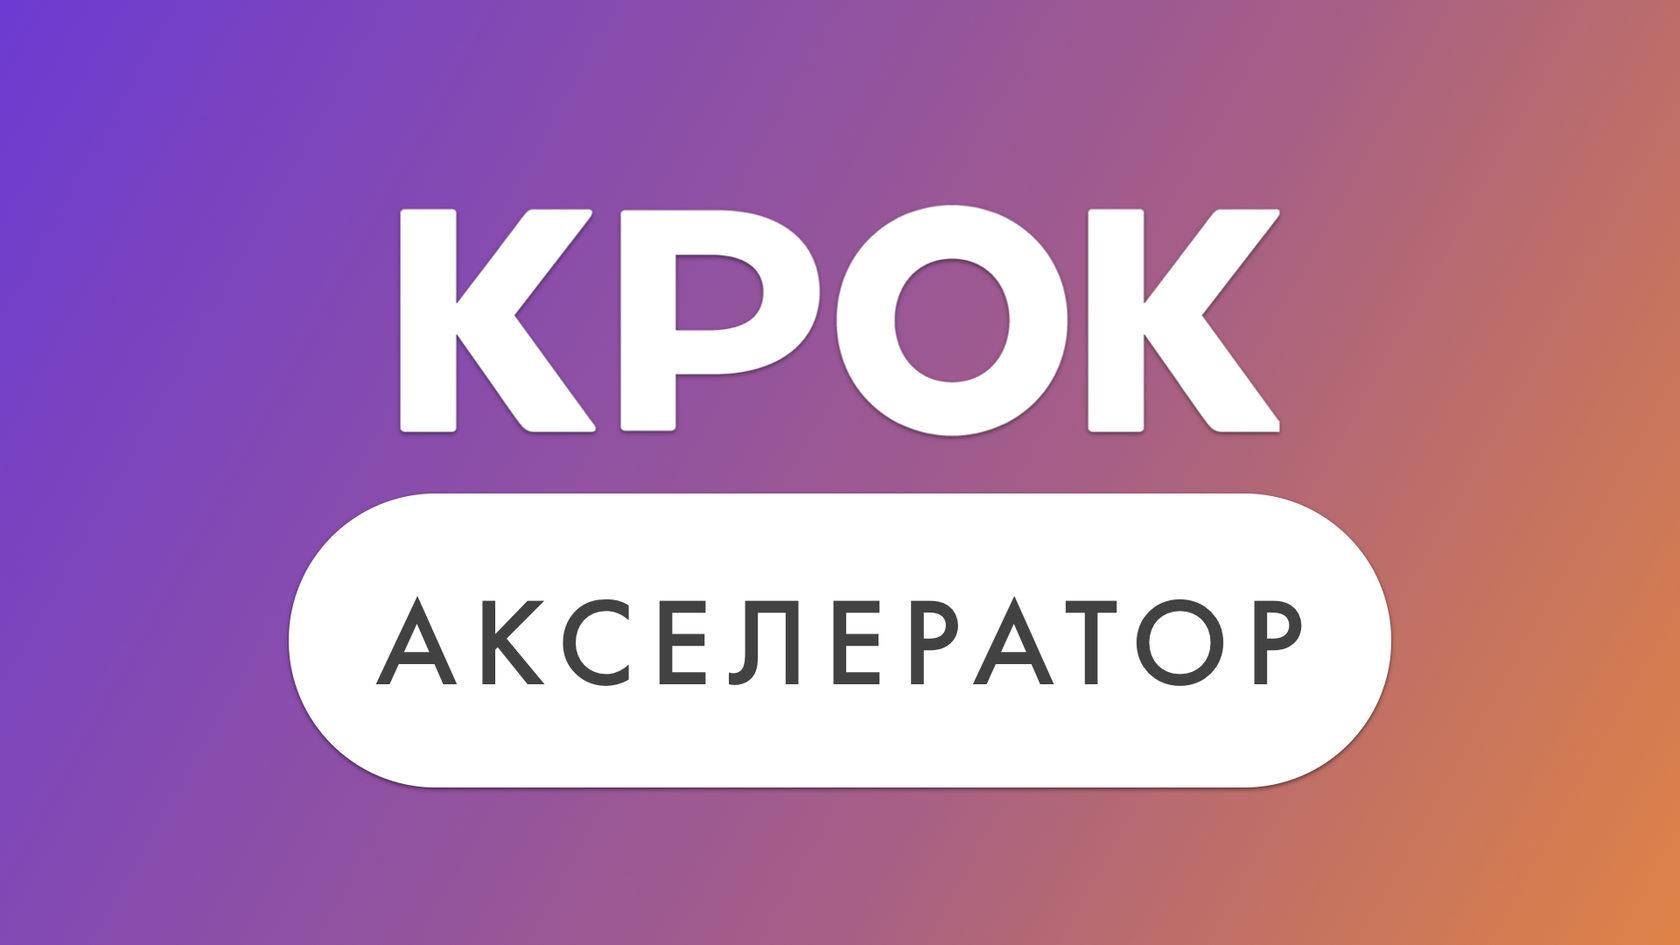 Картинки по запросу АКСЕЛЕРАТОР КРОК 2019